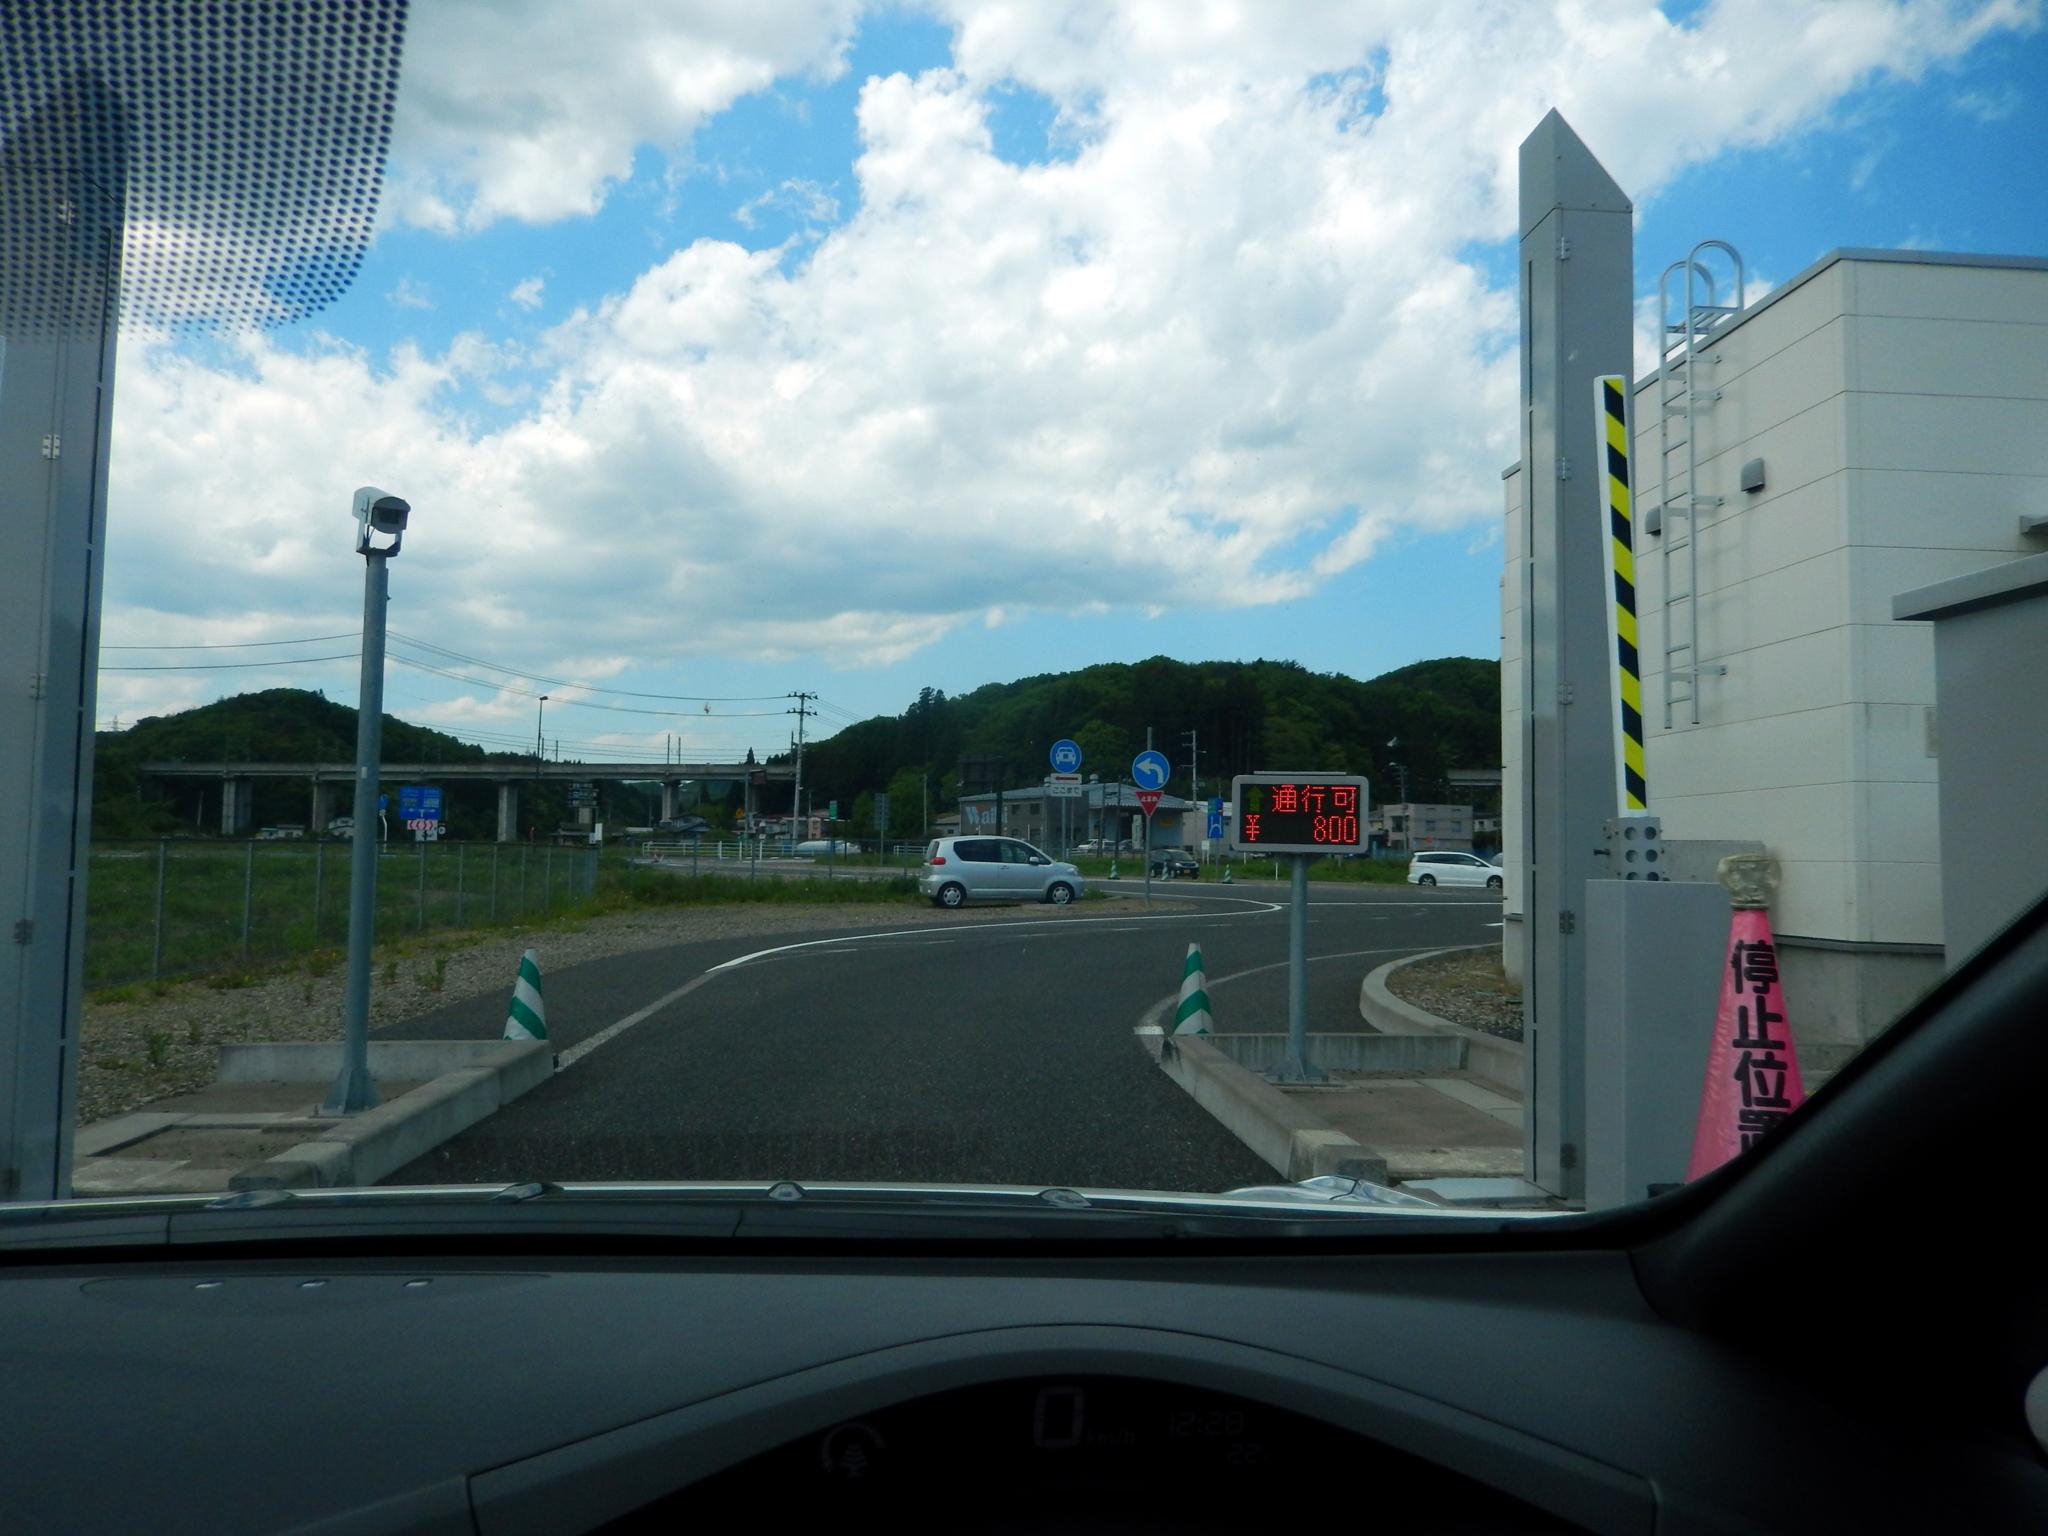 f:id:ToshUeno:20150513122832j:plain